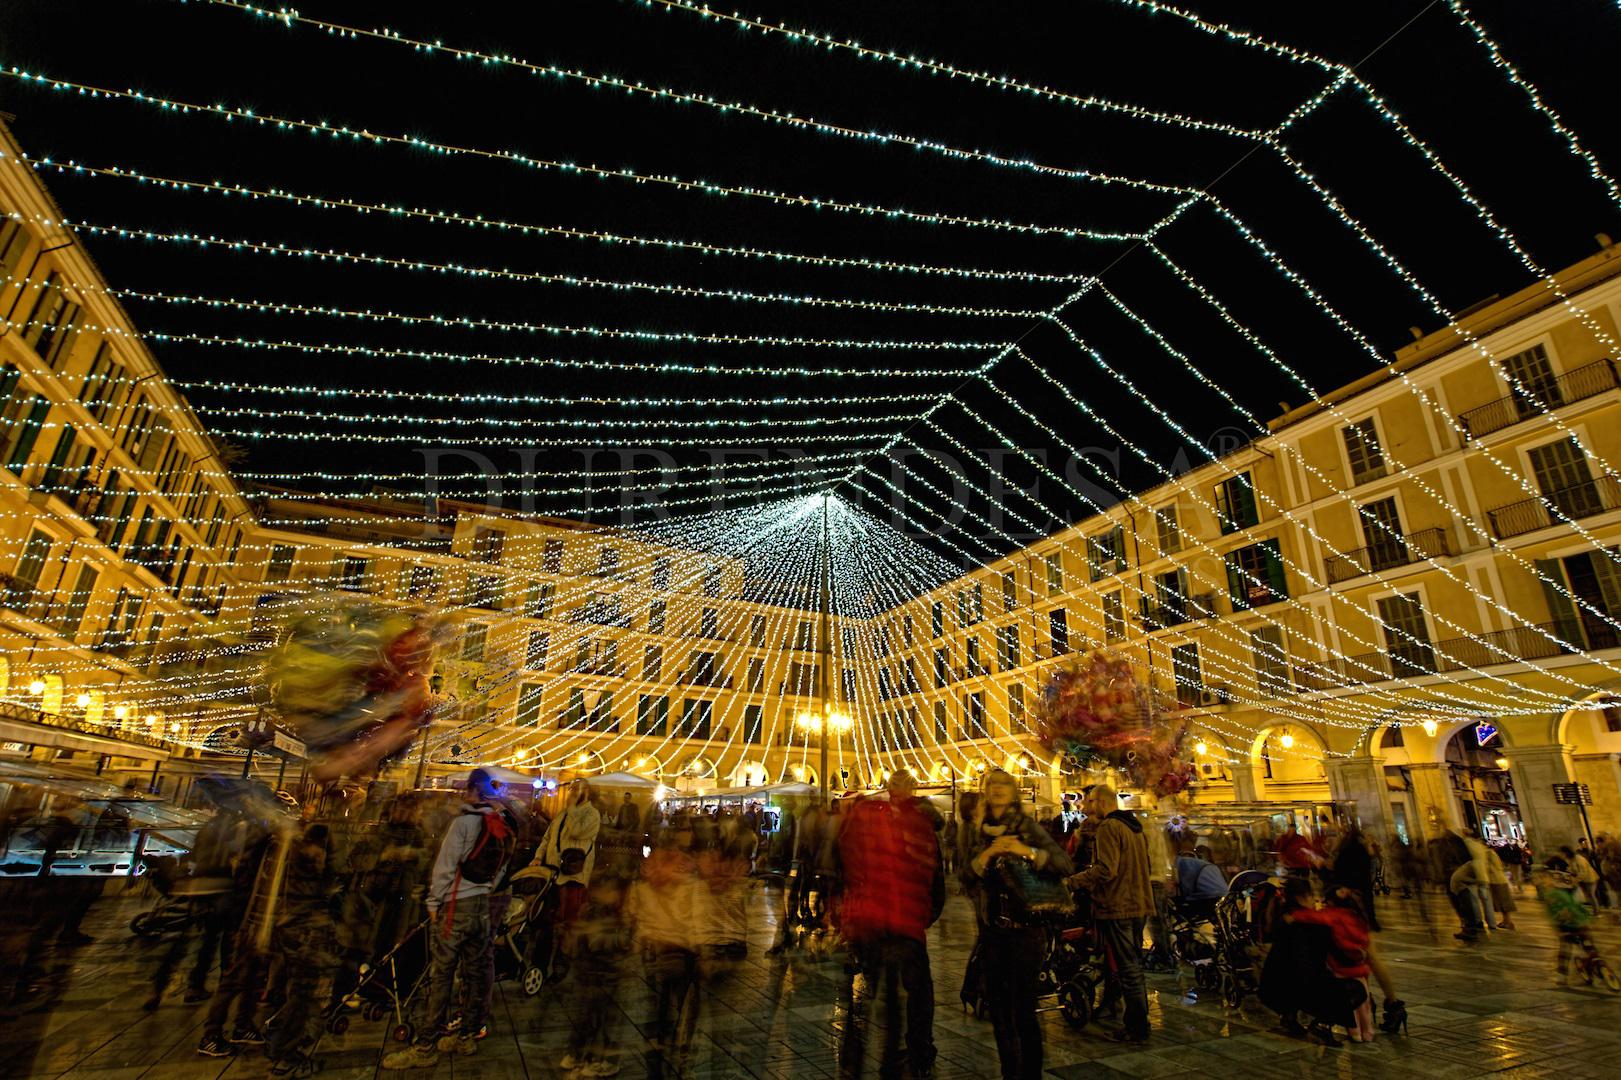 d4ffe3155a4 Qué hacer en Palma de Mallorca en visperas navideñas